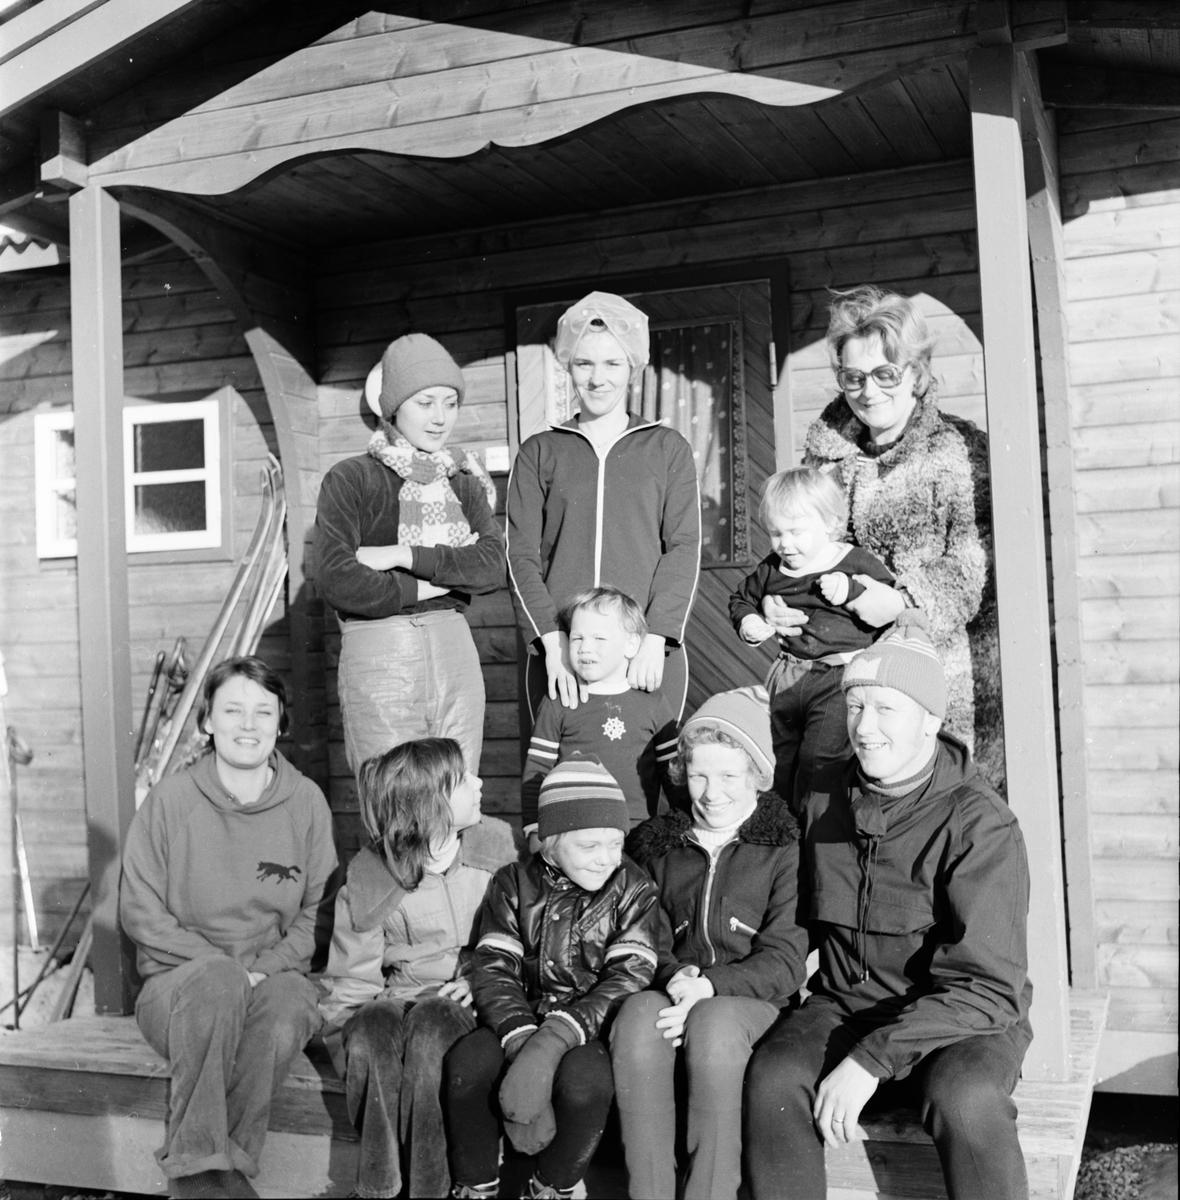 Orfa. Karlstadsbor. Februari 1974